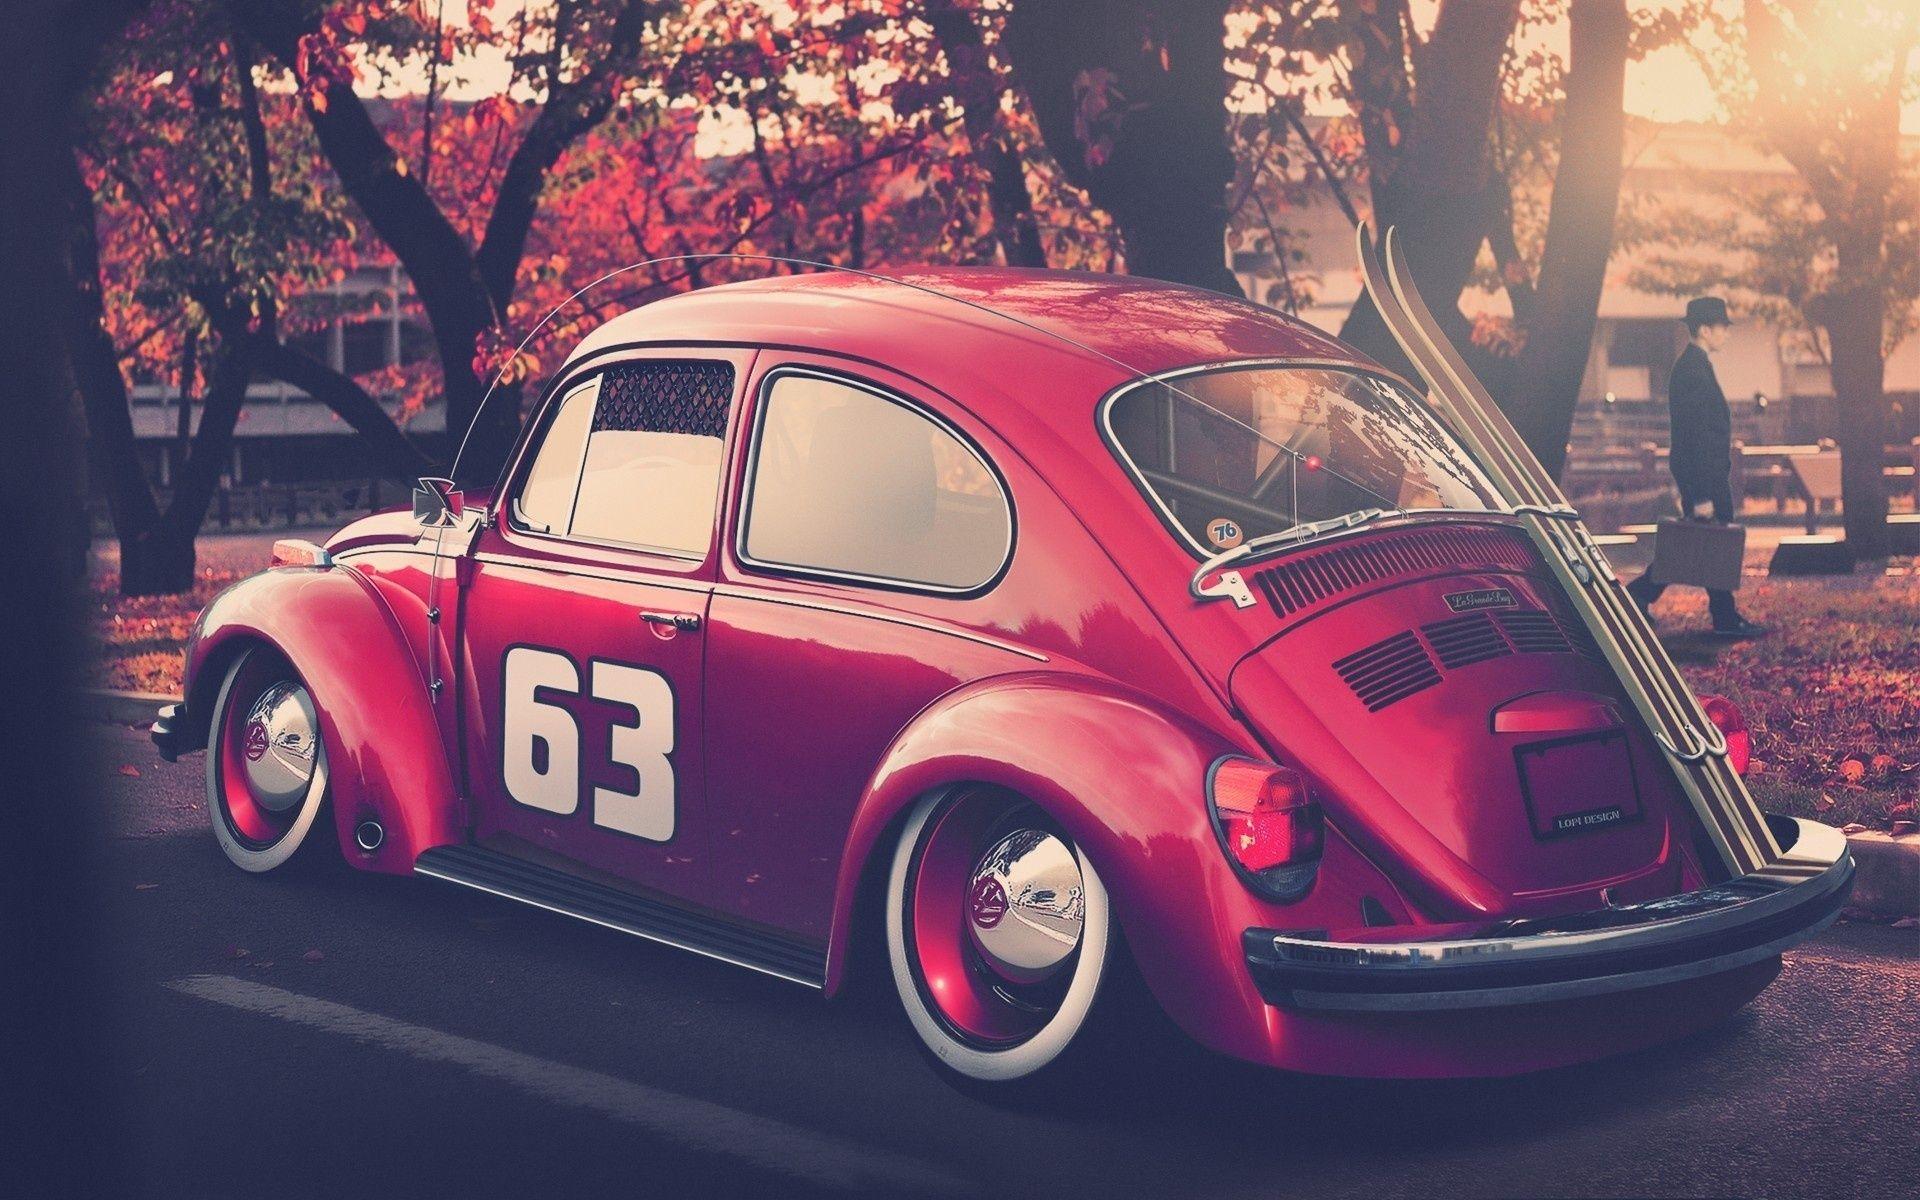 Volkswagen Retro Vehicles Cars Vw Classic Cars Wallpaper